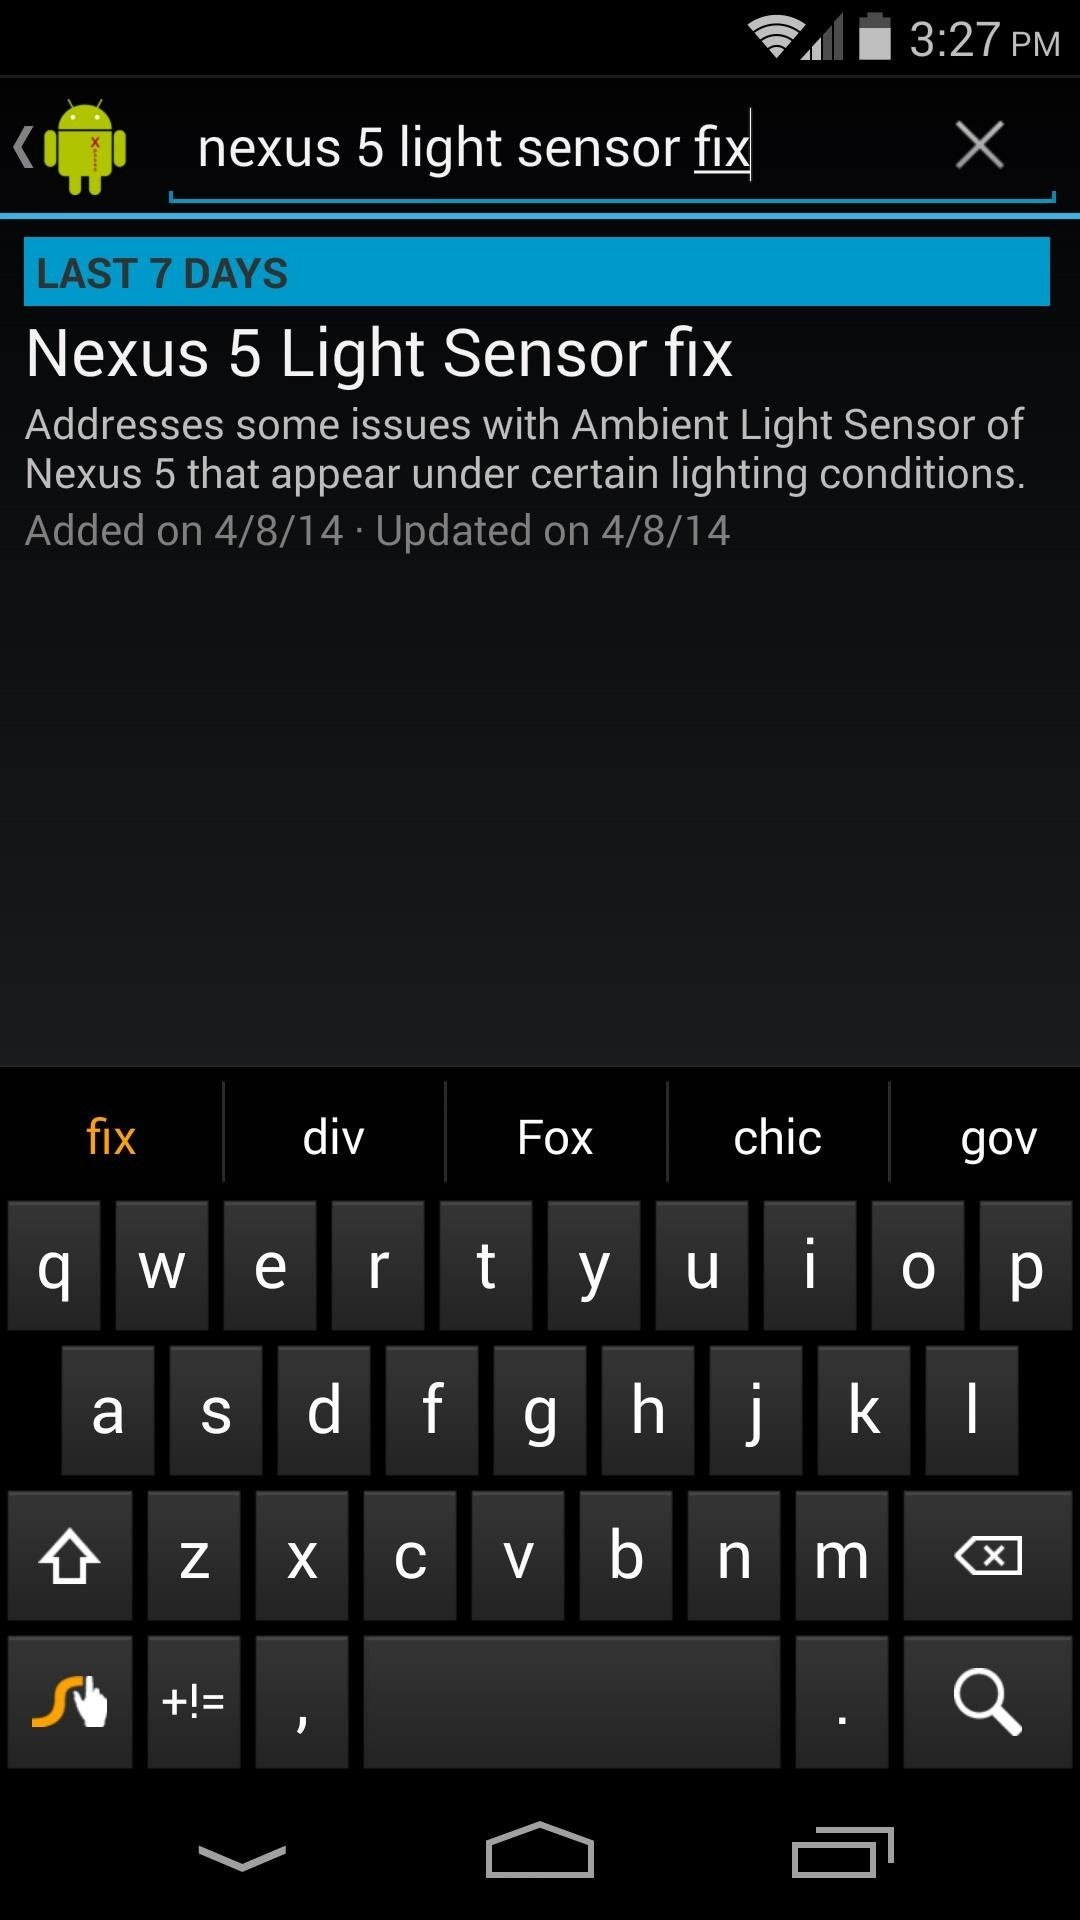 How to Fix the Random Auto Brightness Spikes on Your Nexus 5